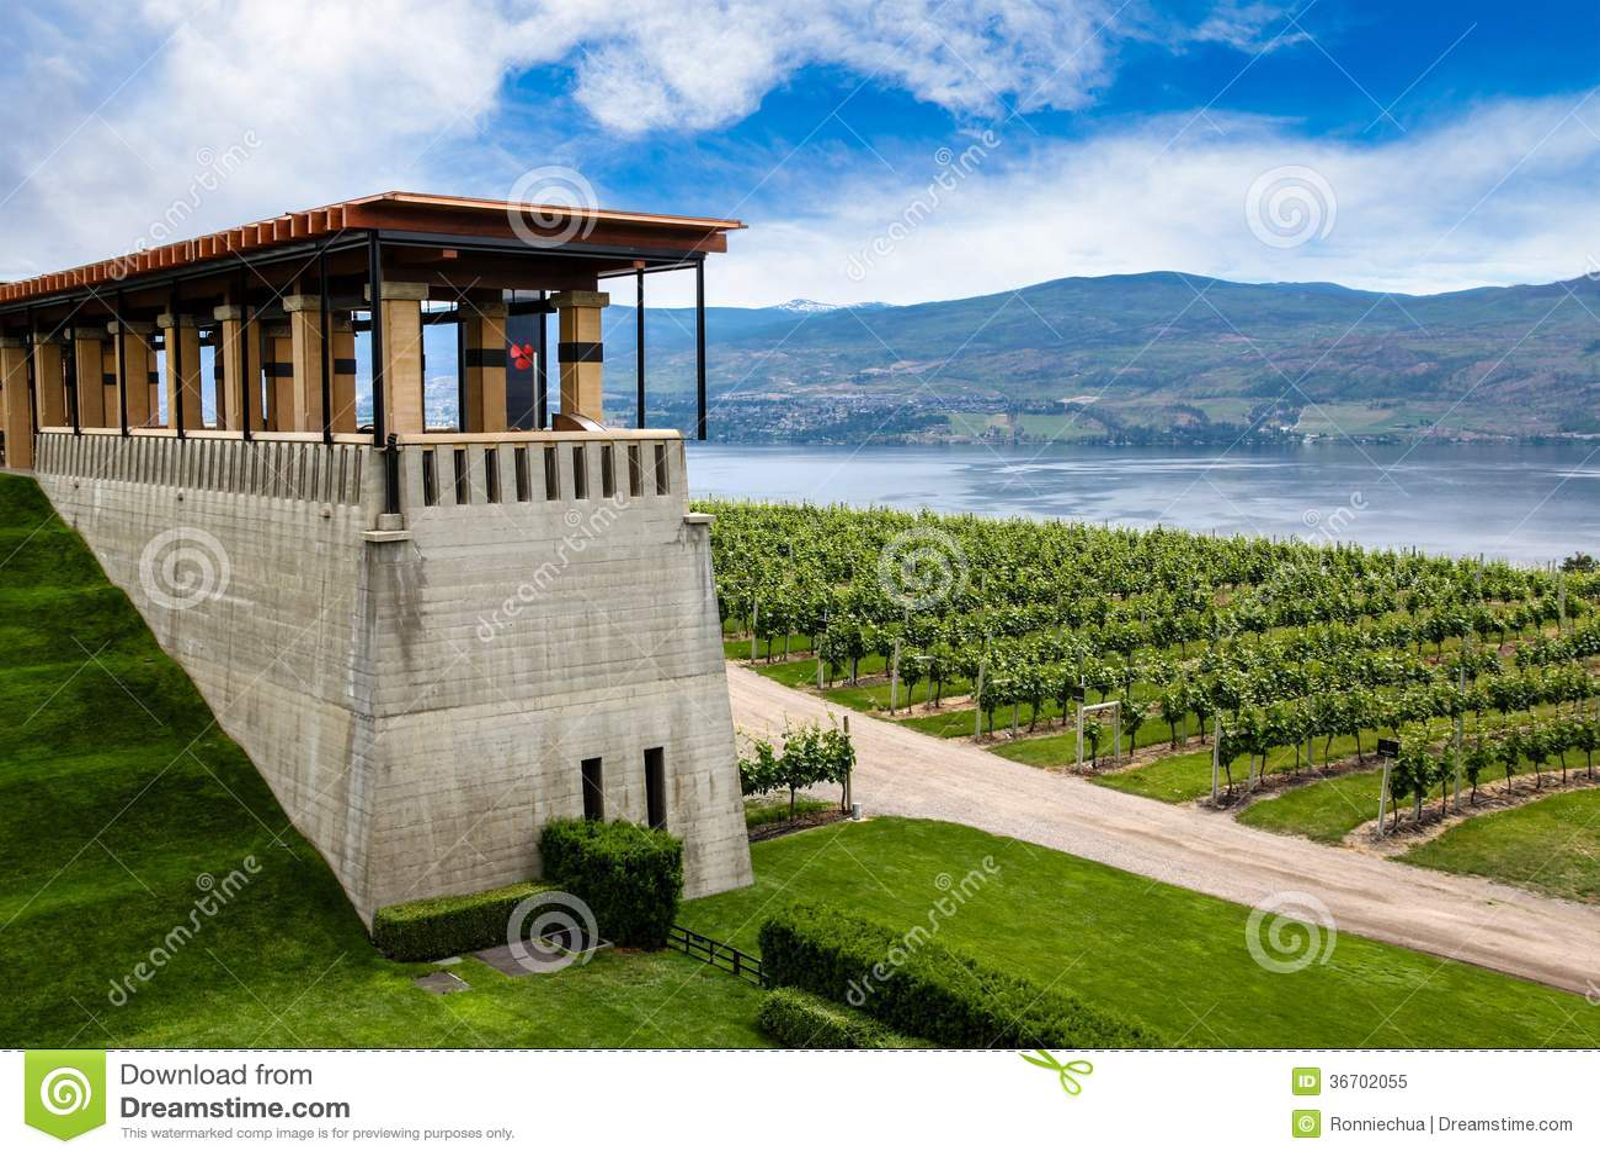 Winery vineyard in kelowna british columbia royalty free for Terrace canada